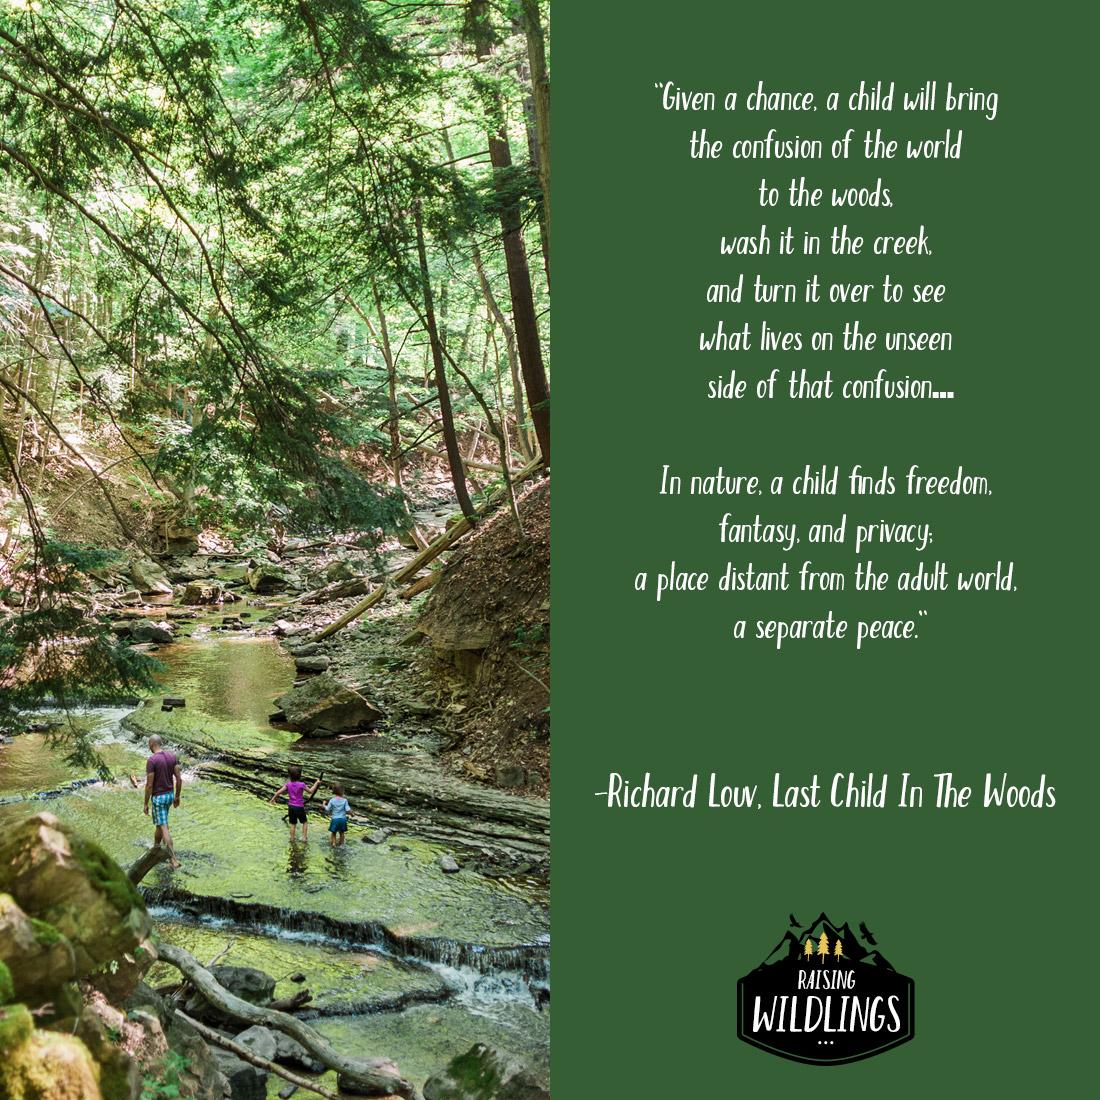 Raising Wildlings -Cambridge Forest School Initiative